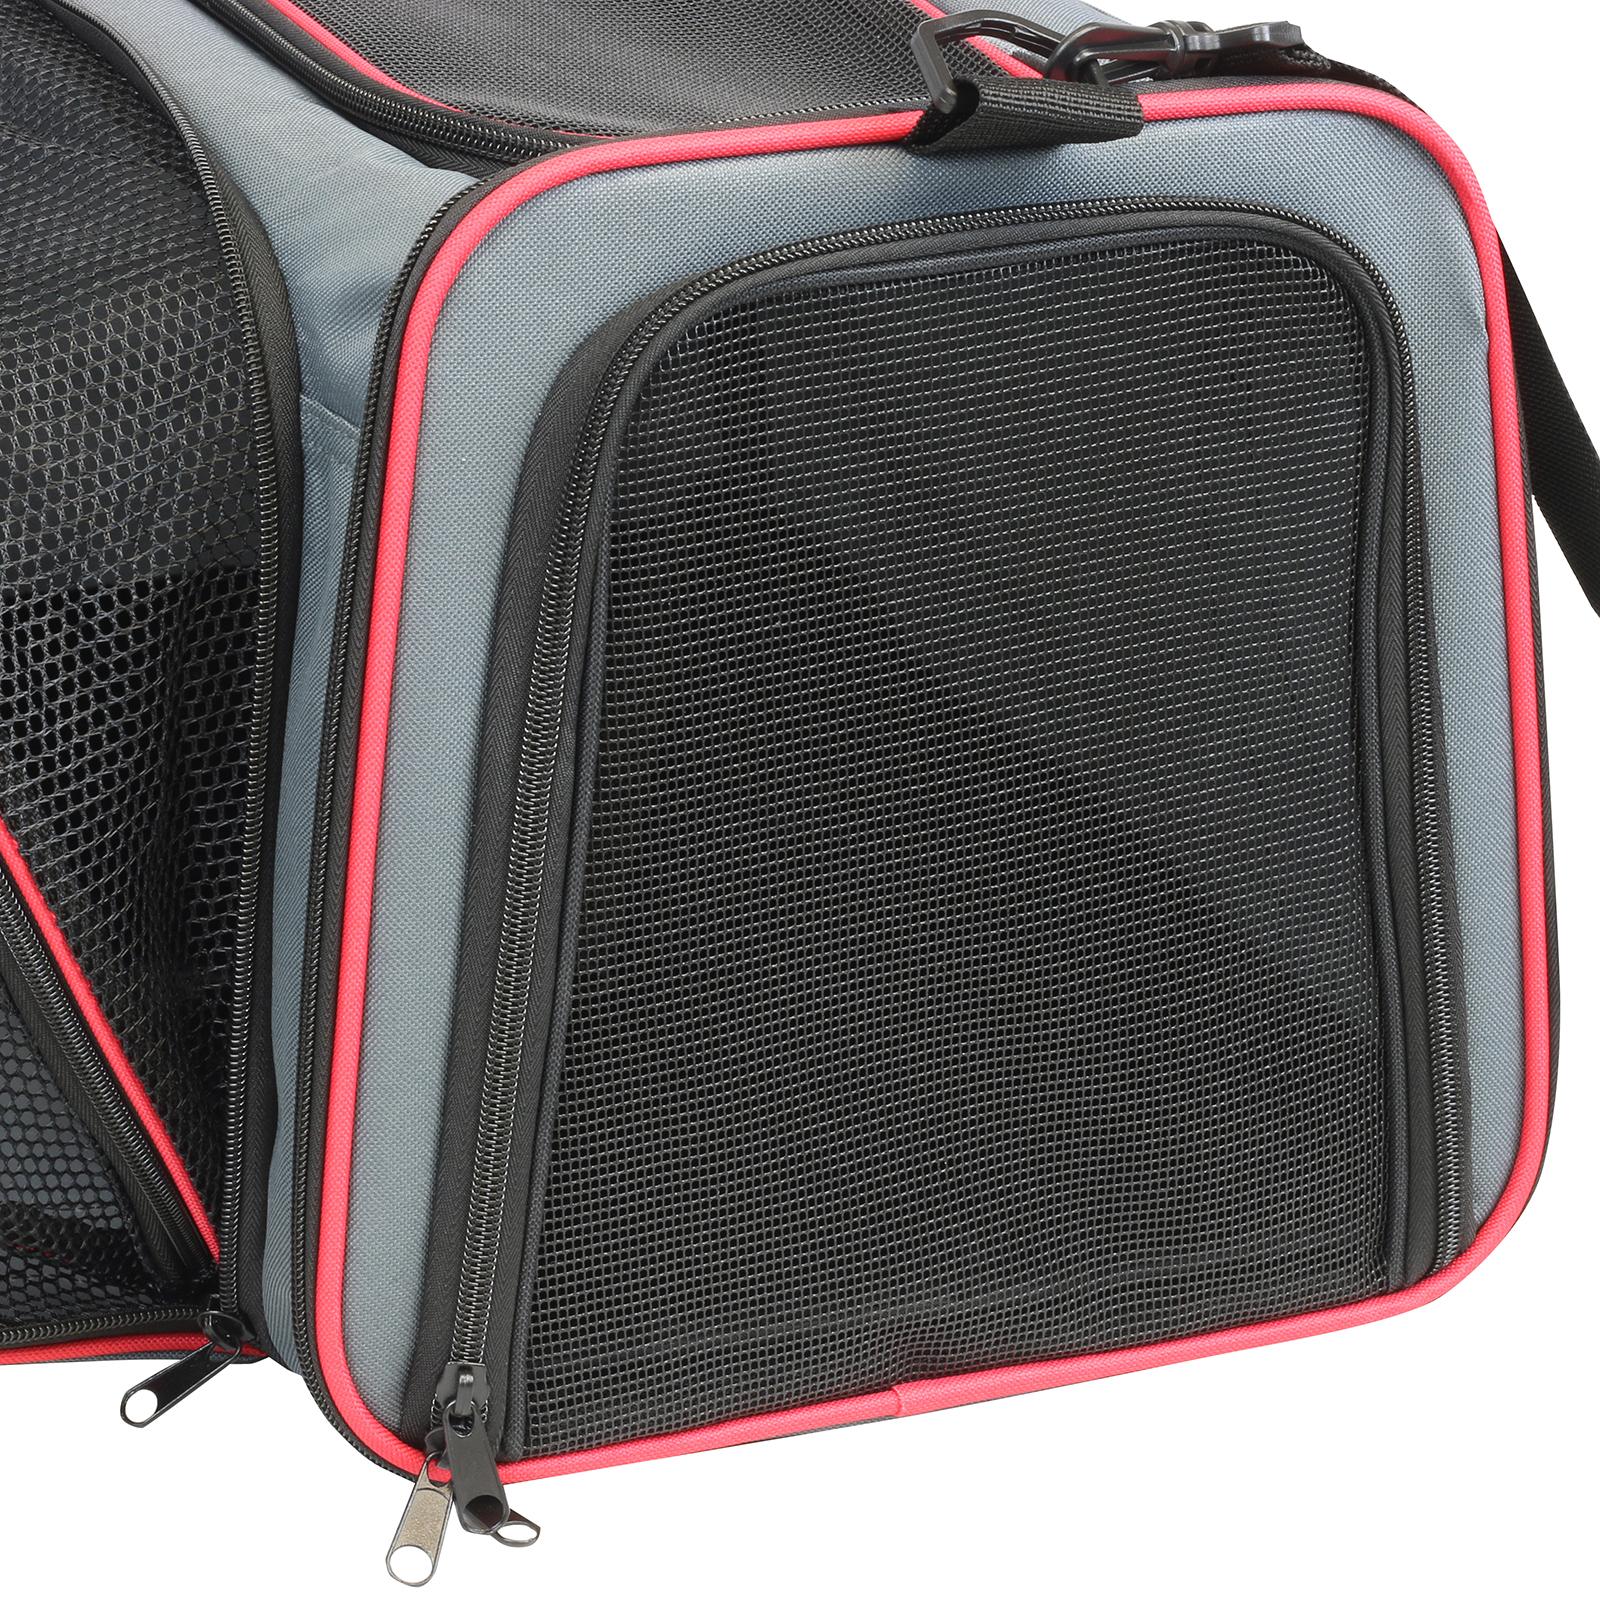 Cat Carrier Bag Uk For Air Travel